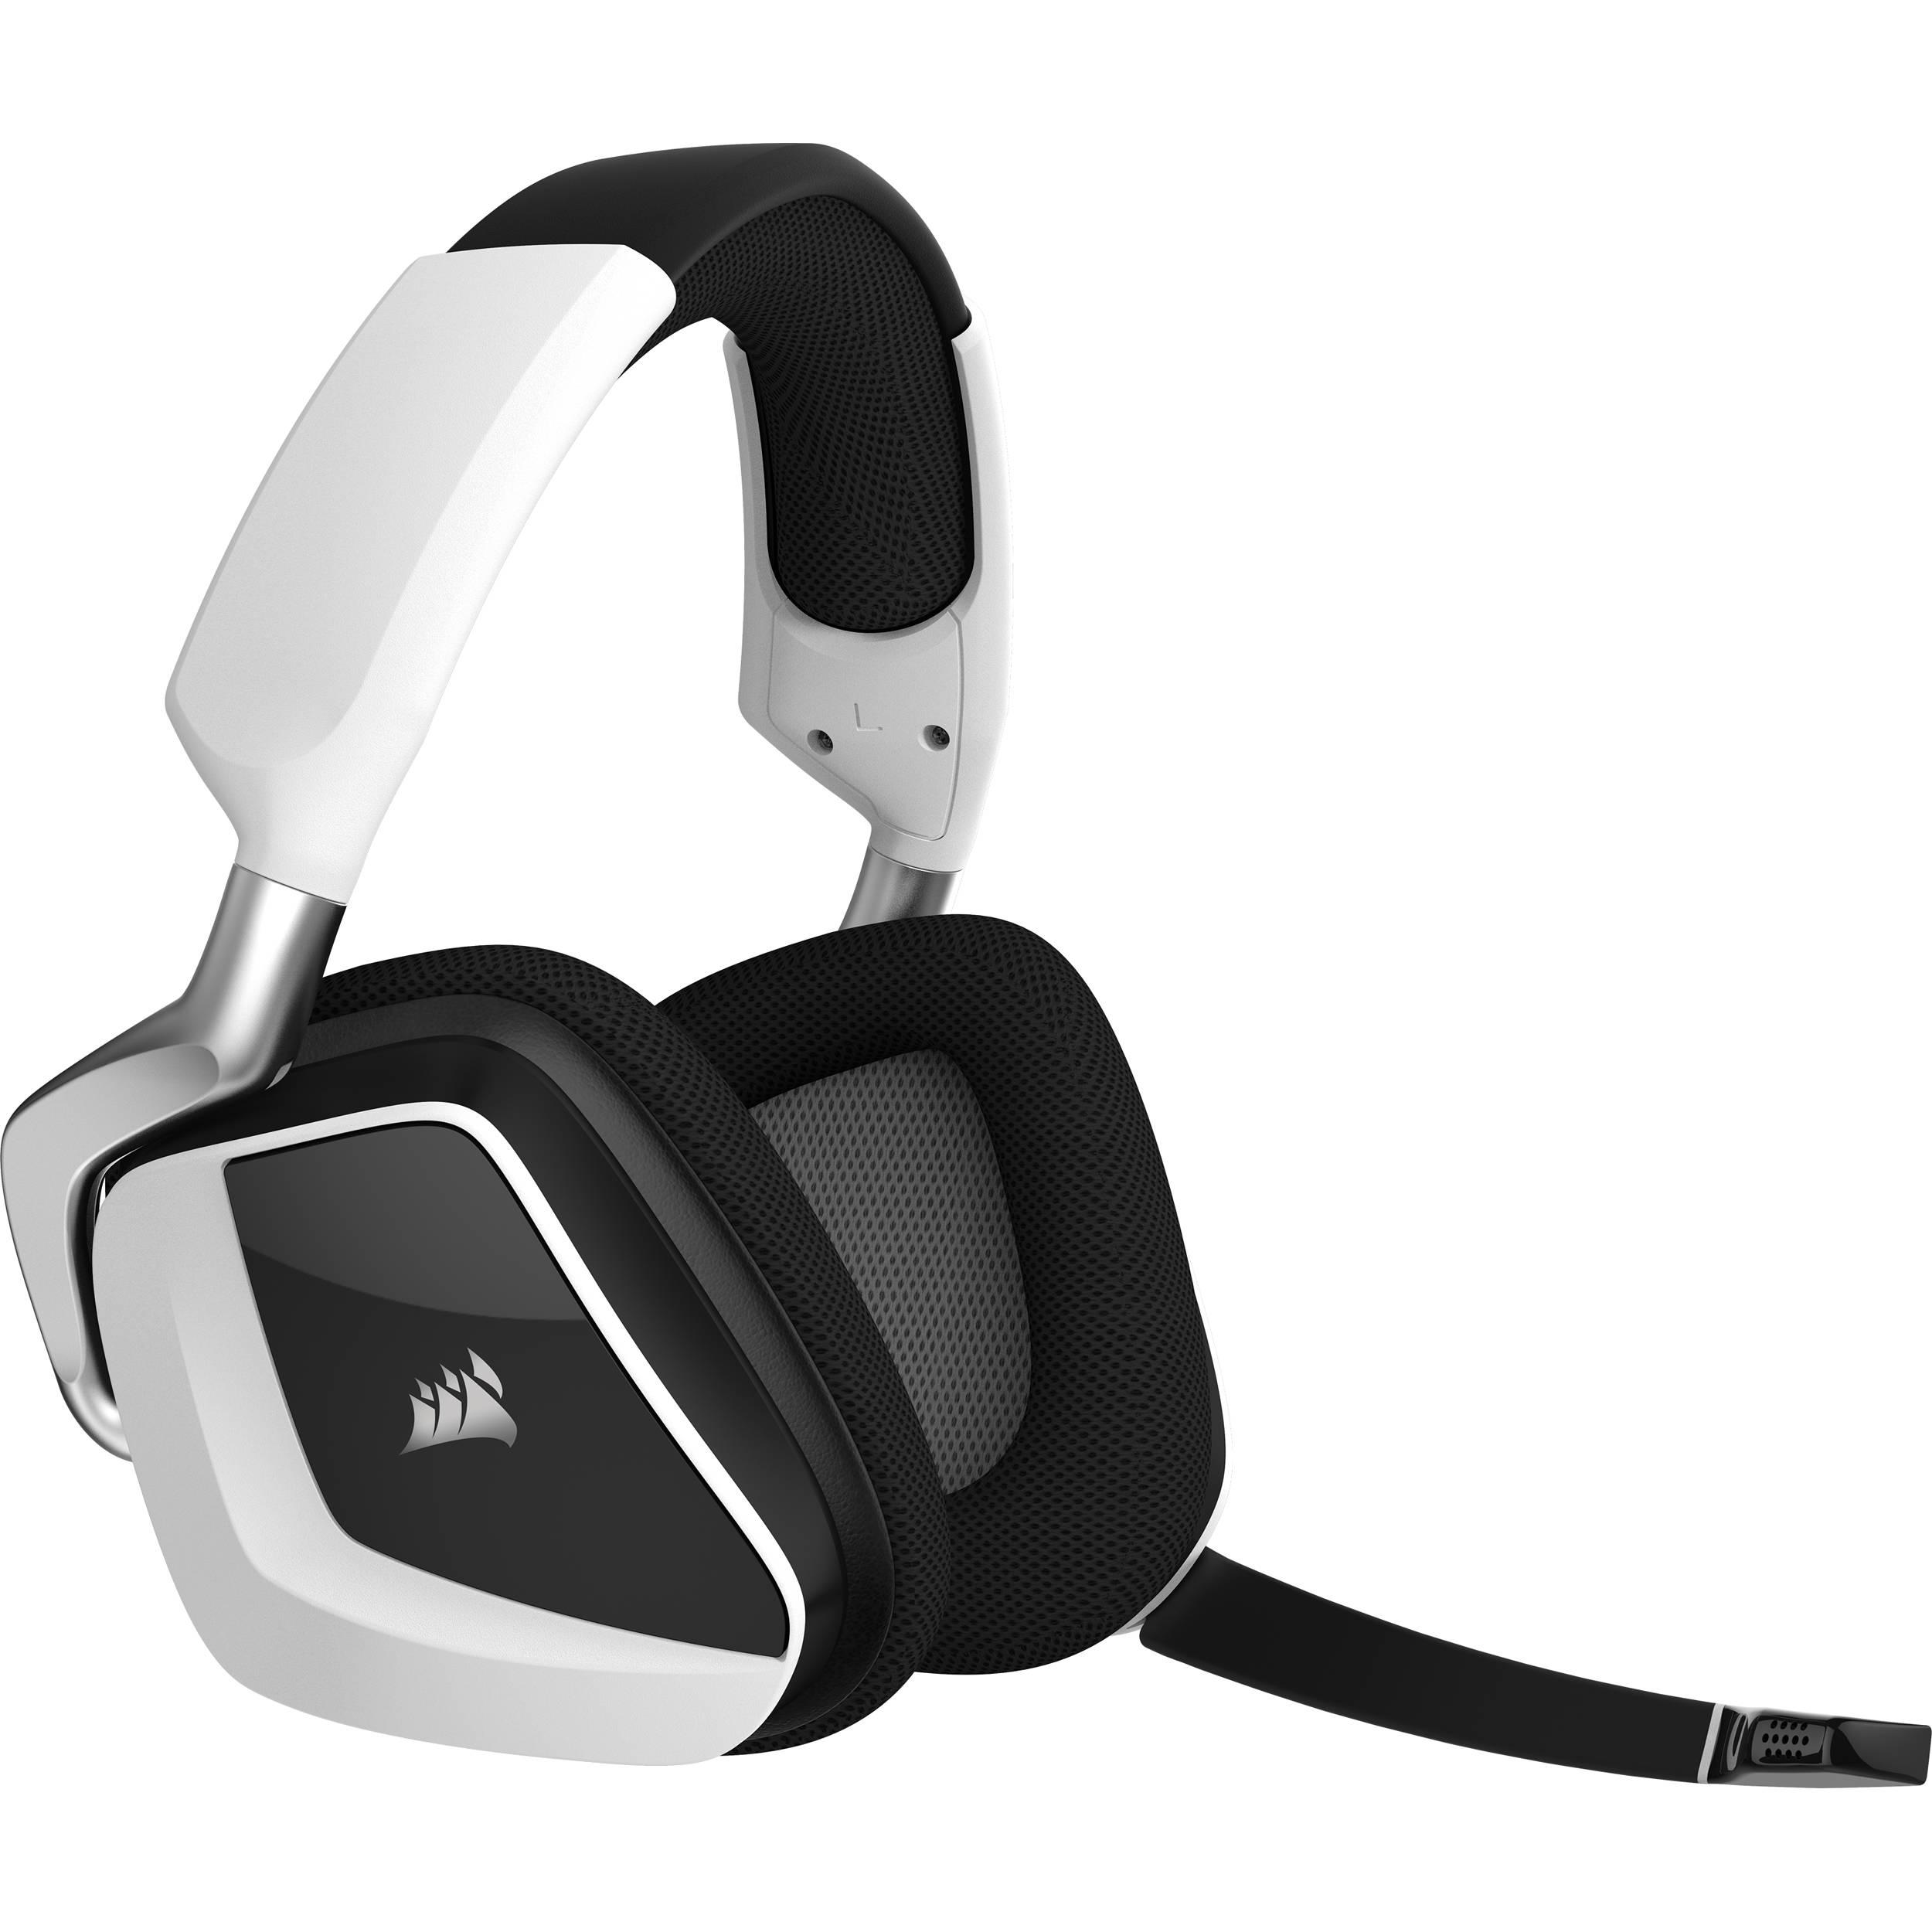 Corsair VOID PRO RGB Wireless Gaming Headset (White)